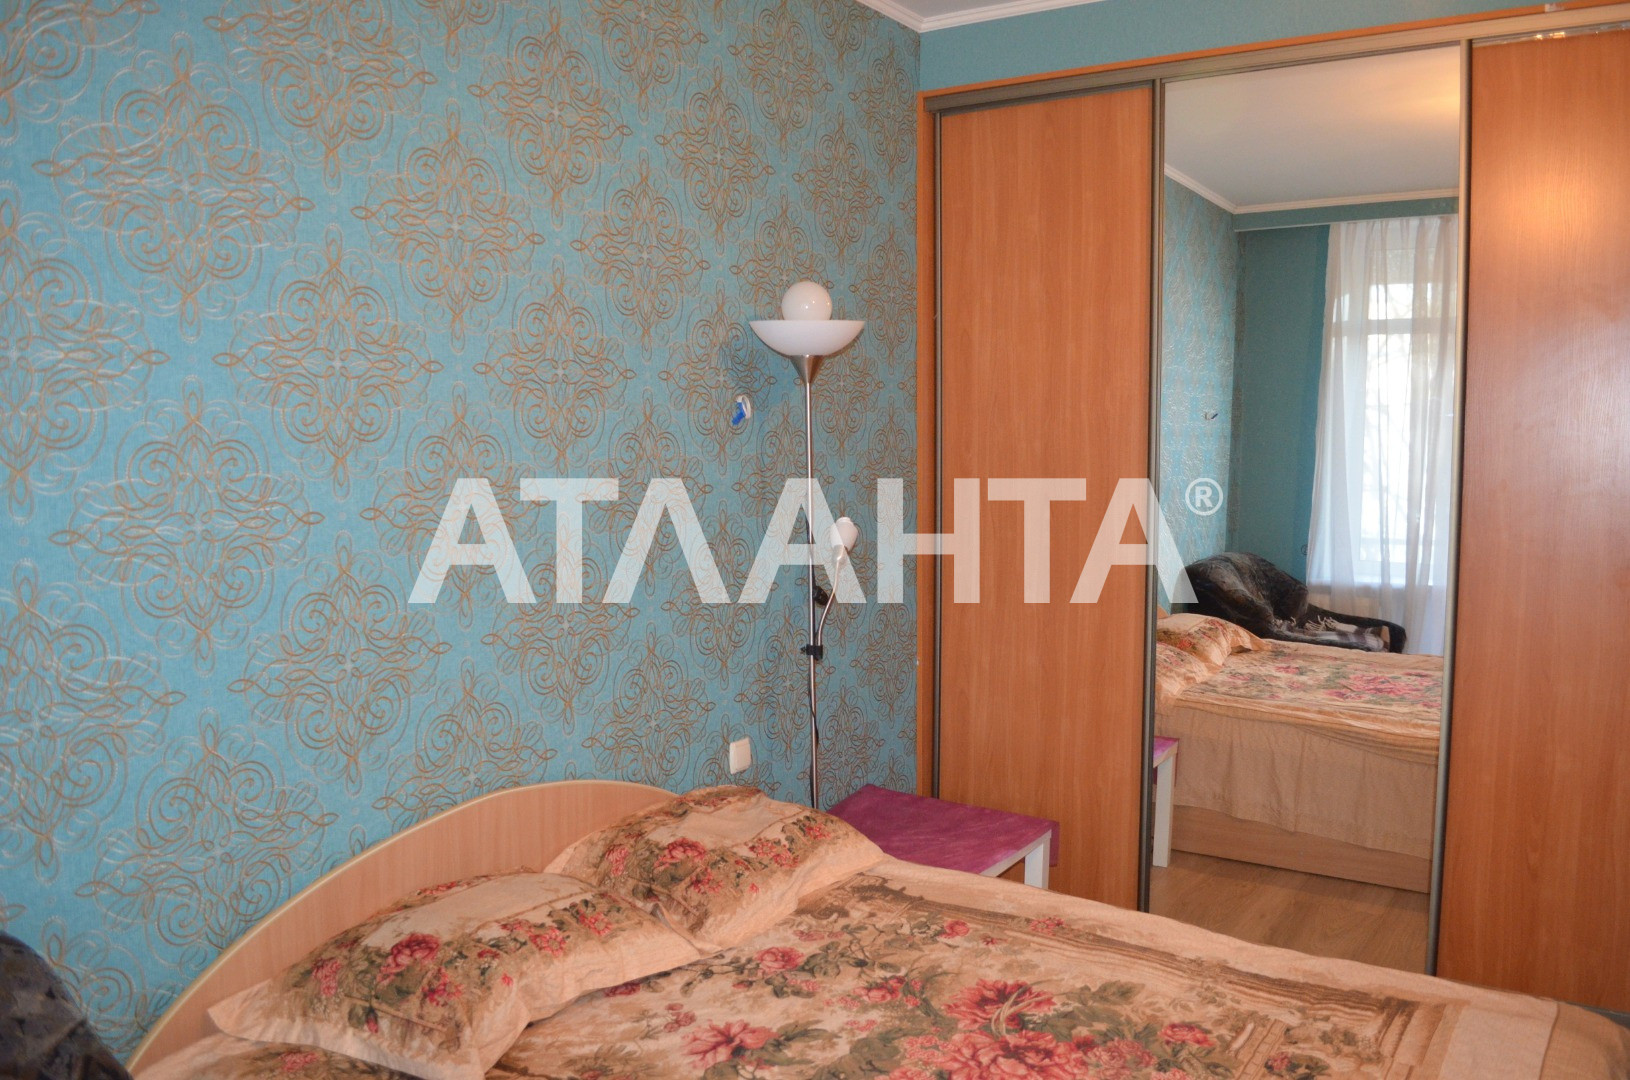 Продается 3-комнатная Квартира на ул. Французский Бул. (Пролетарский Бул.) — 98 000 у.е. (фото №3)